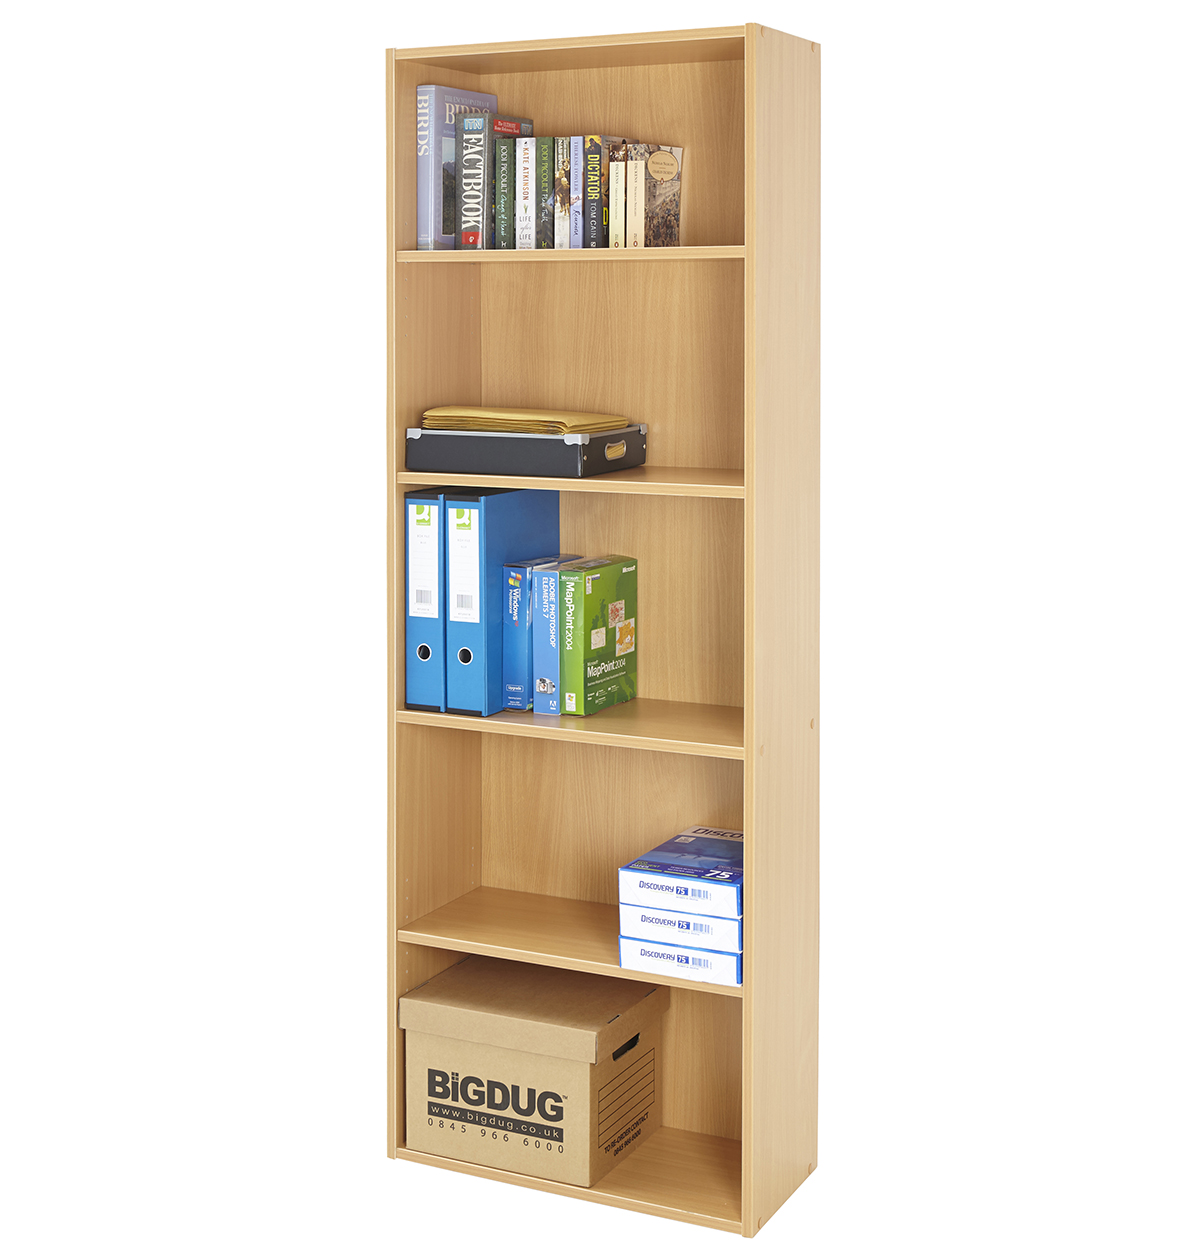 Bookcase Bookshelf Wood Beech 5 Shelf Storage Furniture